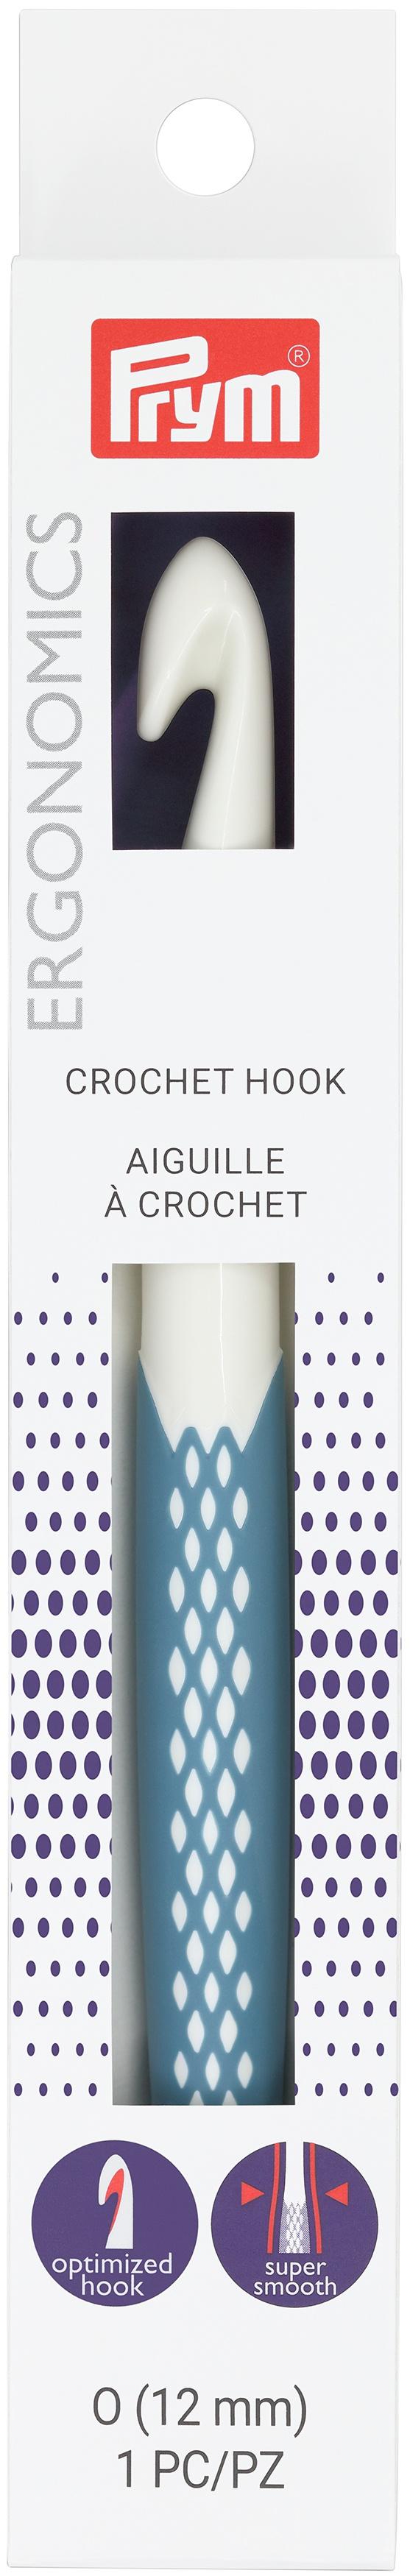 Prym Crochet Hook-Size O/12mm